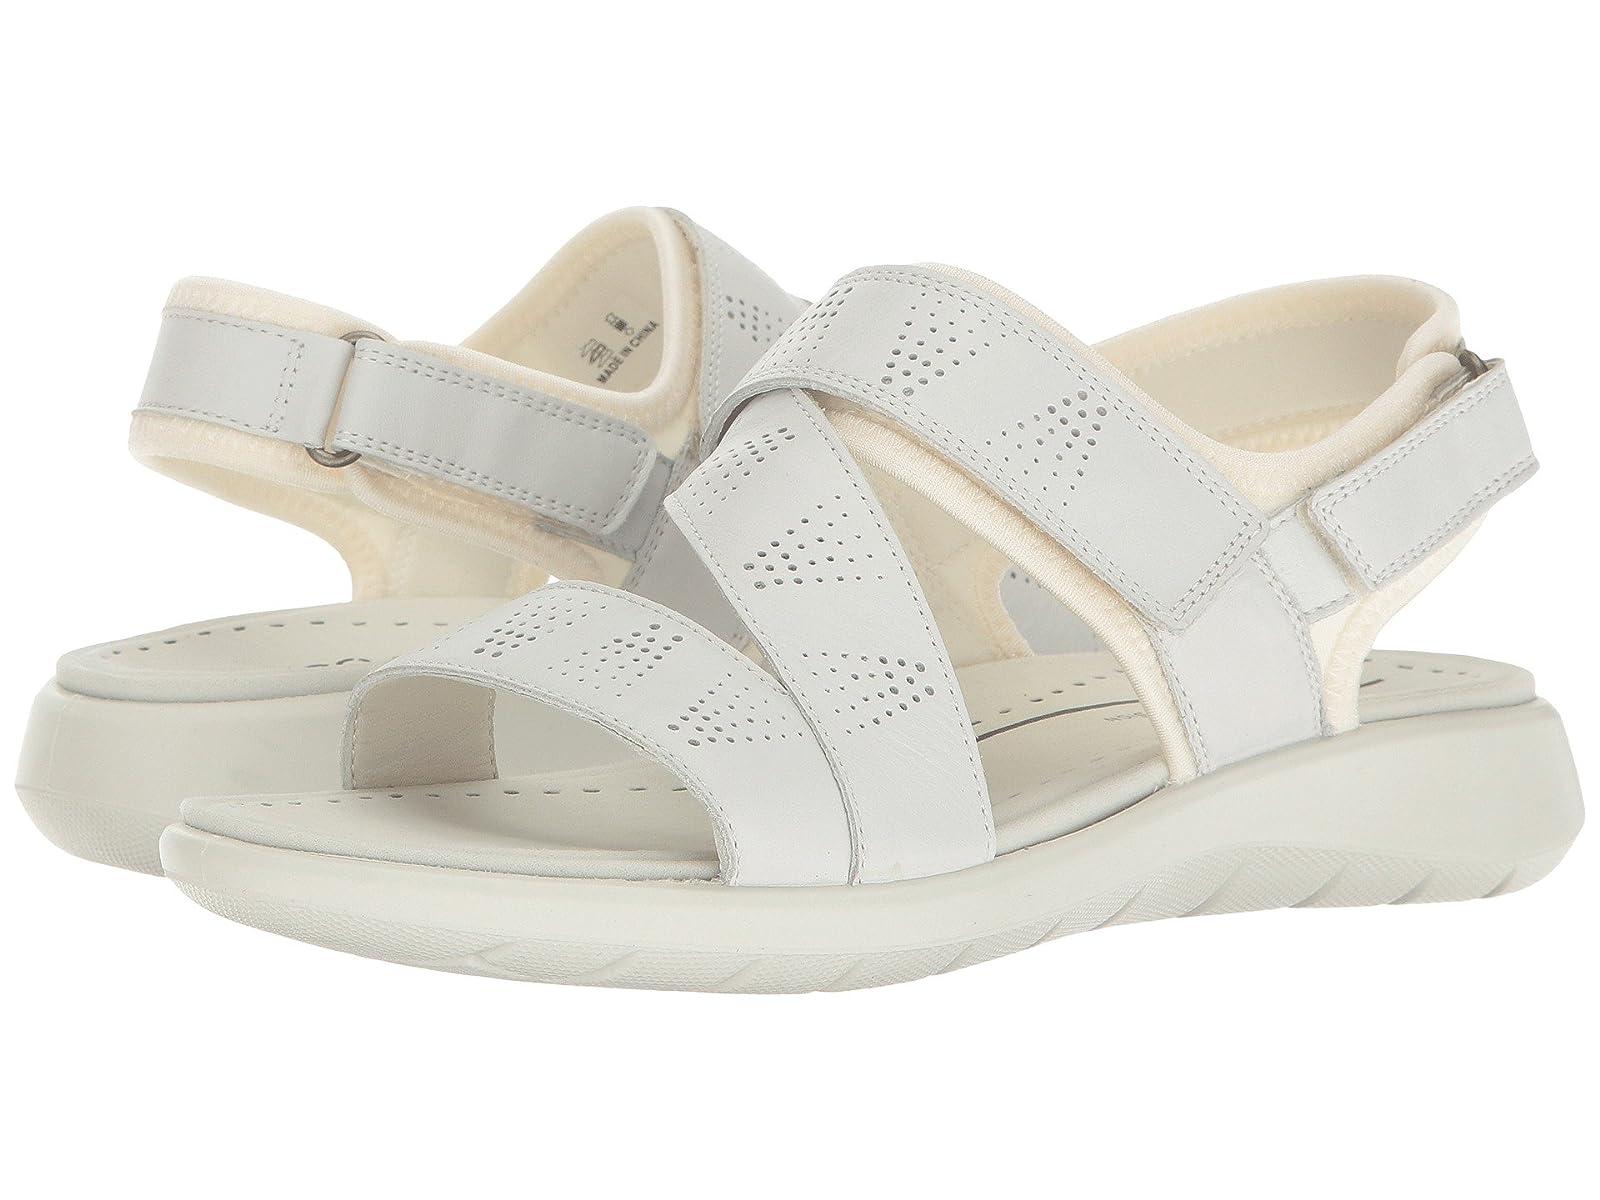 ECCO Soft 5 Cross-Strap SandalCheap and distinctive eye-catching shoes